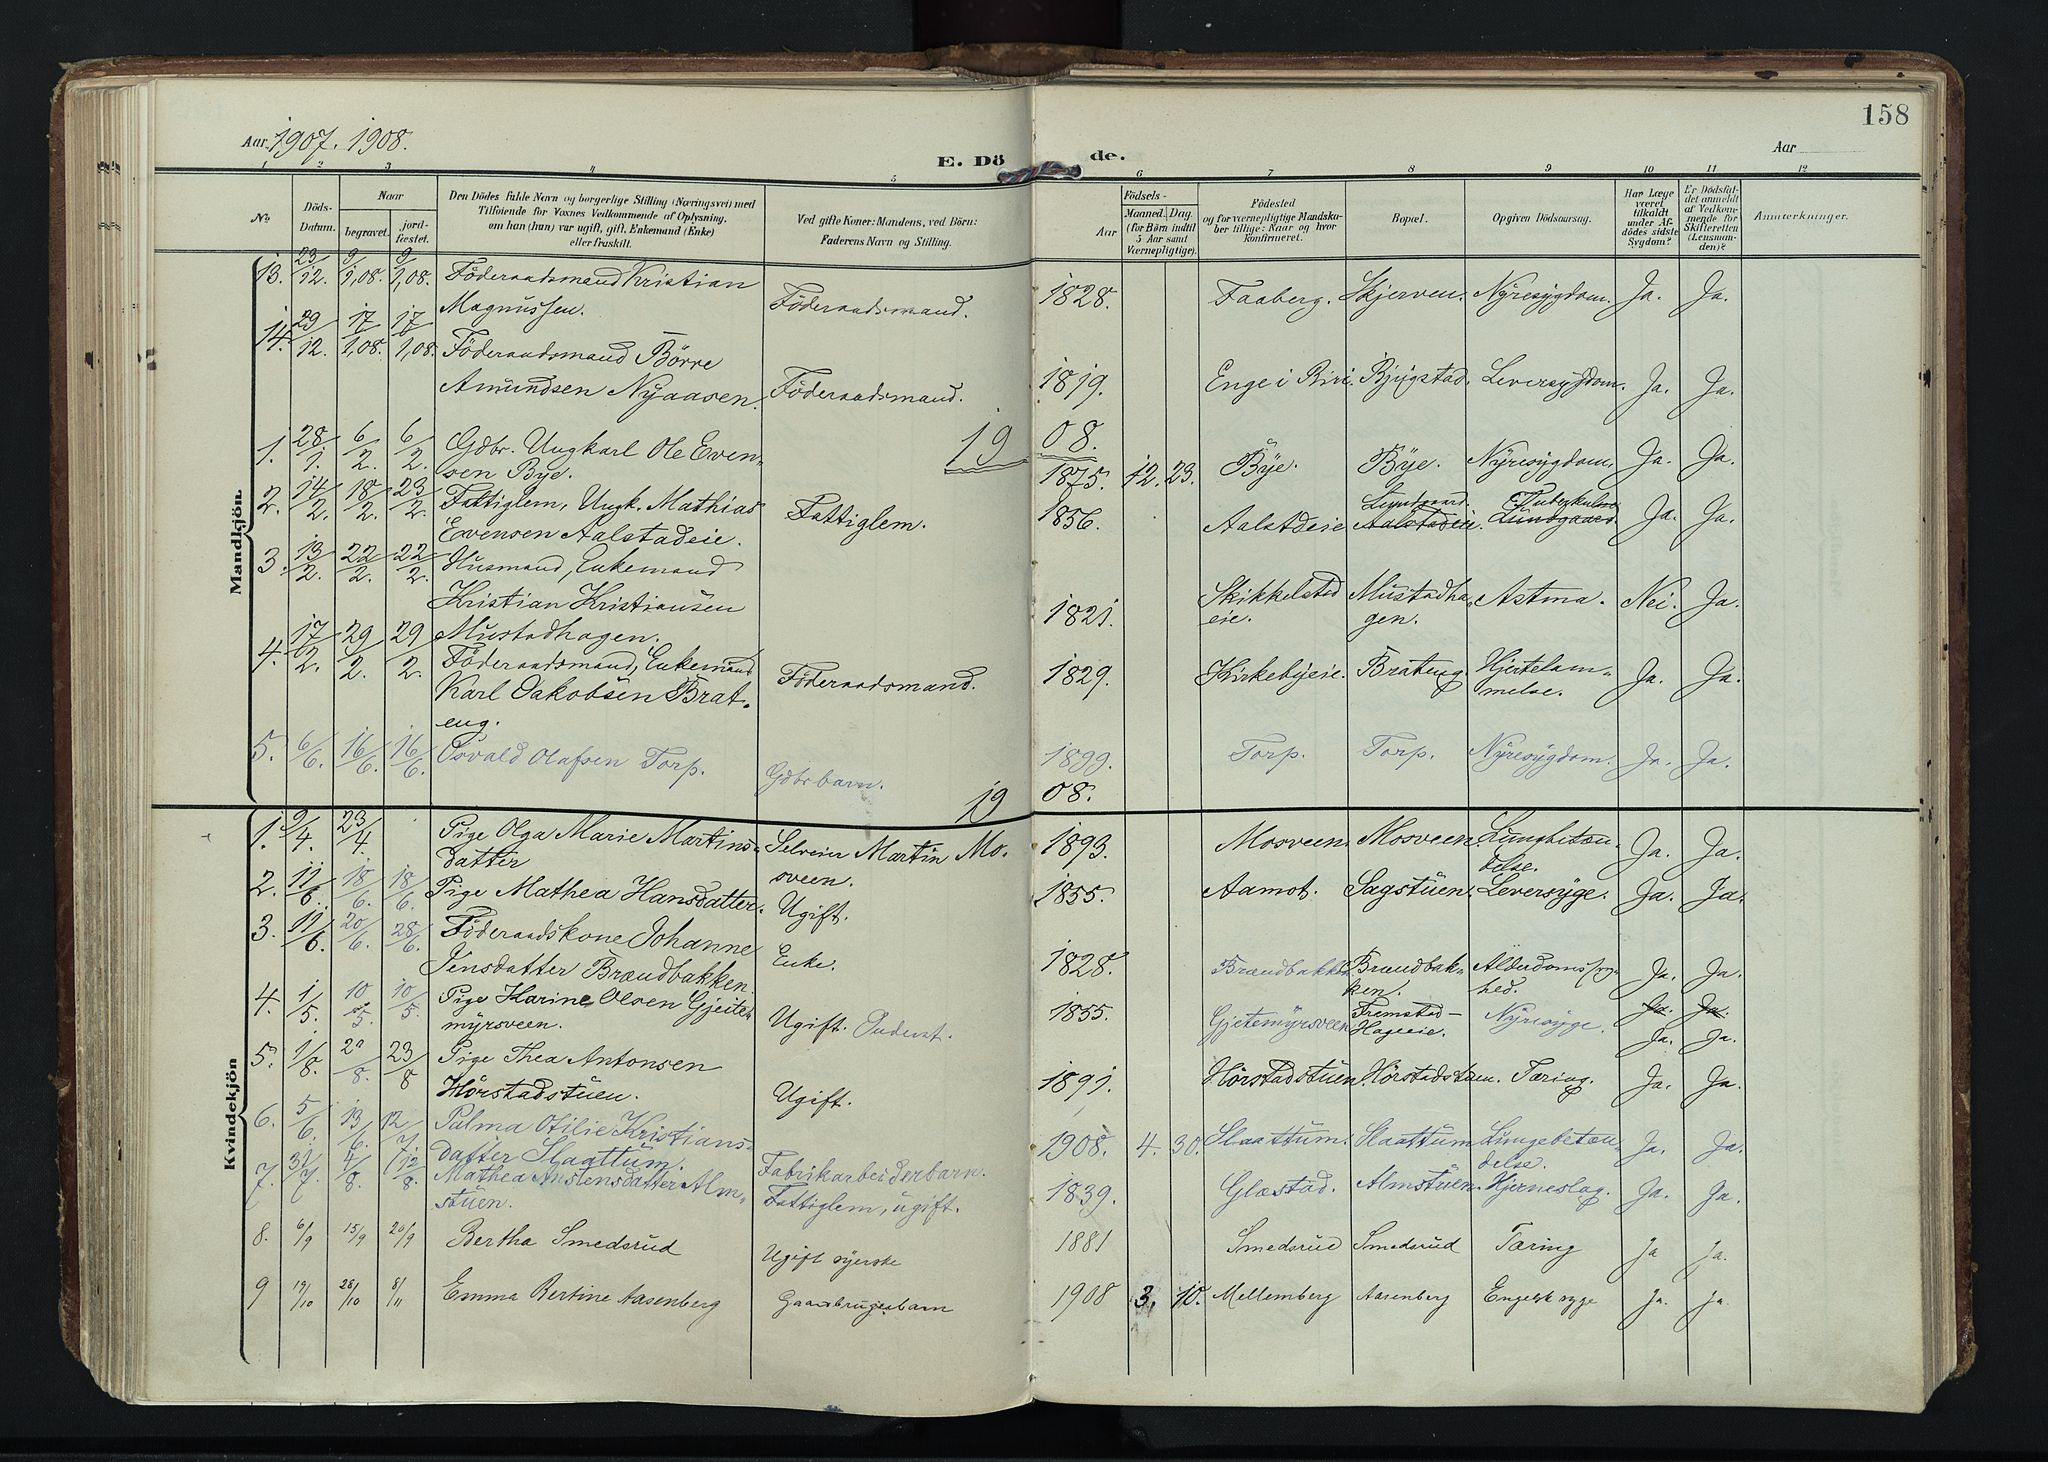 SAH, Vardal prestekontor, H/Ha/Haa/L0020: Ministerialbok nr. 20, 1907-1921, s. 158